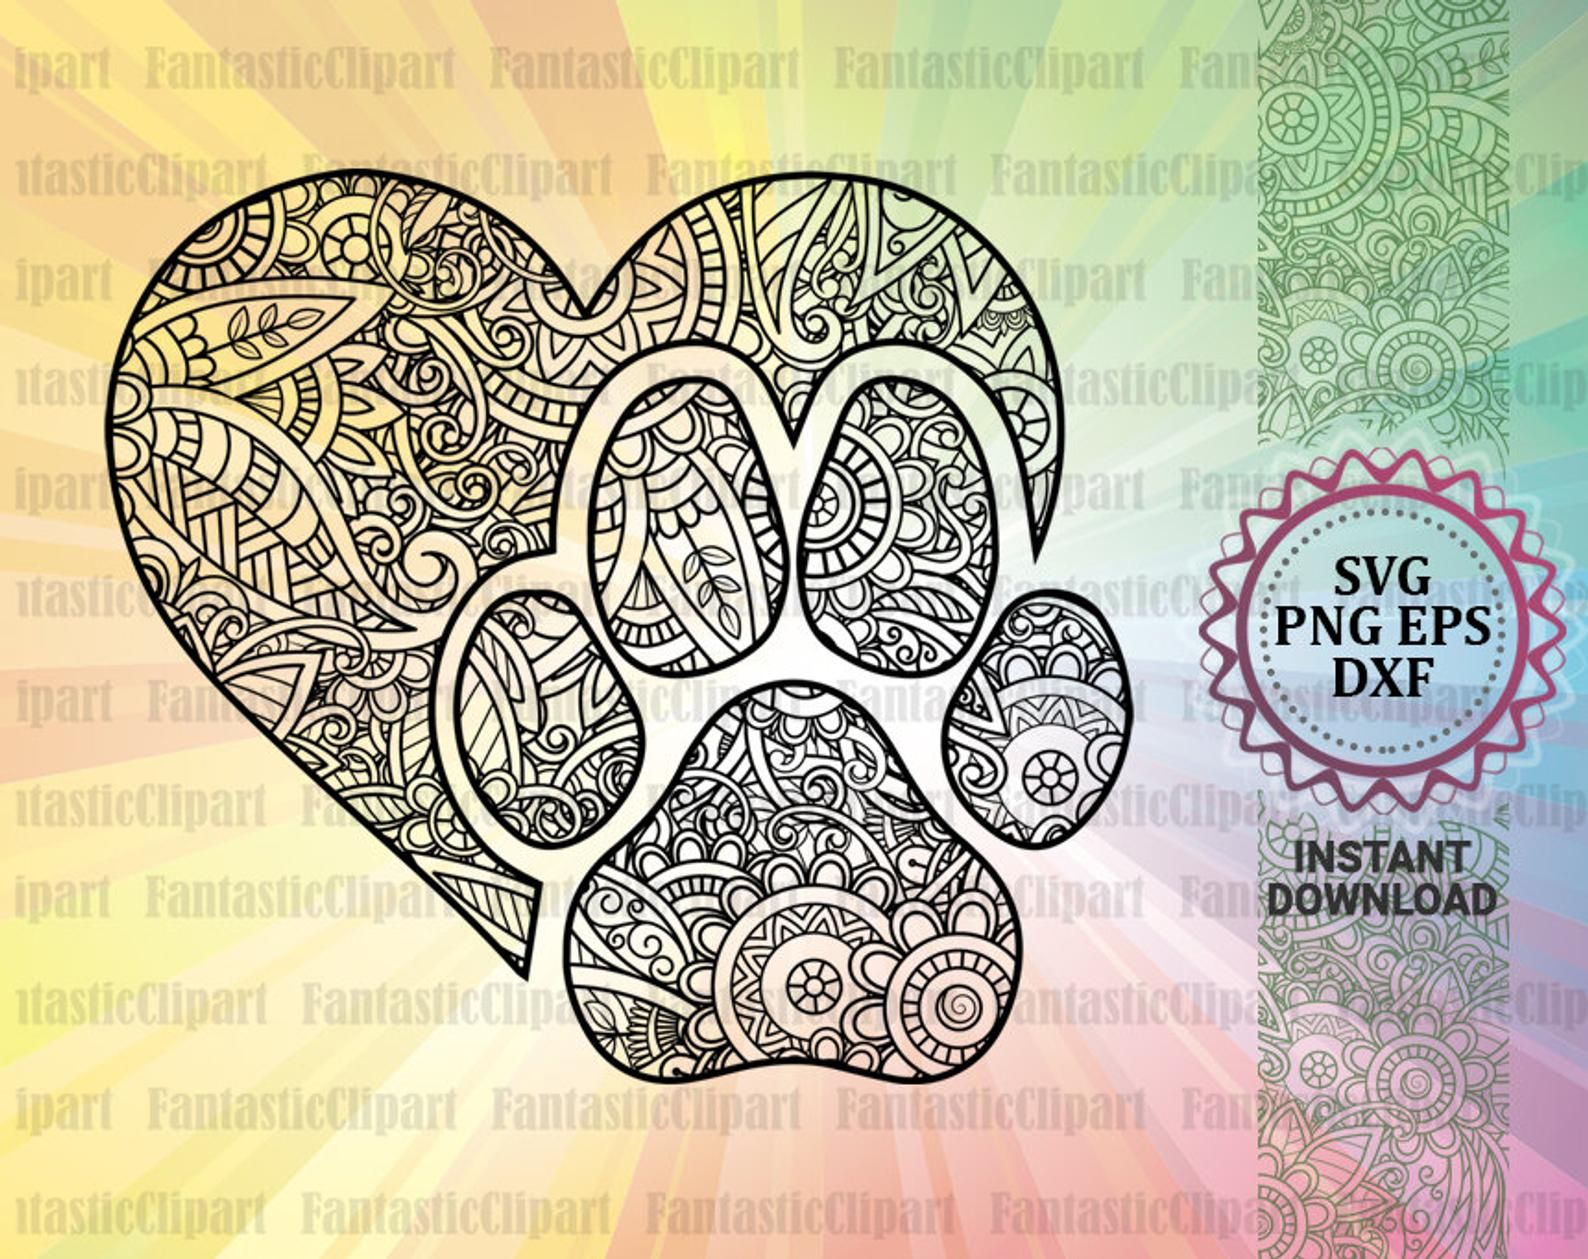 Heart Paw Print Svg Love Dog Svg Love Dog Paw Heart Paw Etsy Paw Print Art Paw Drawing Dog Paw Drawing Heart with icons of dog paw prints vector. heart paw print svg love dog svg love